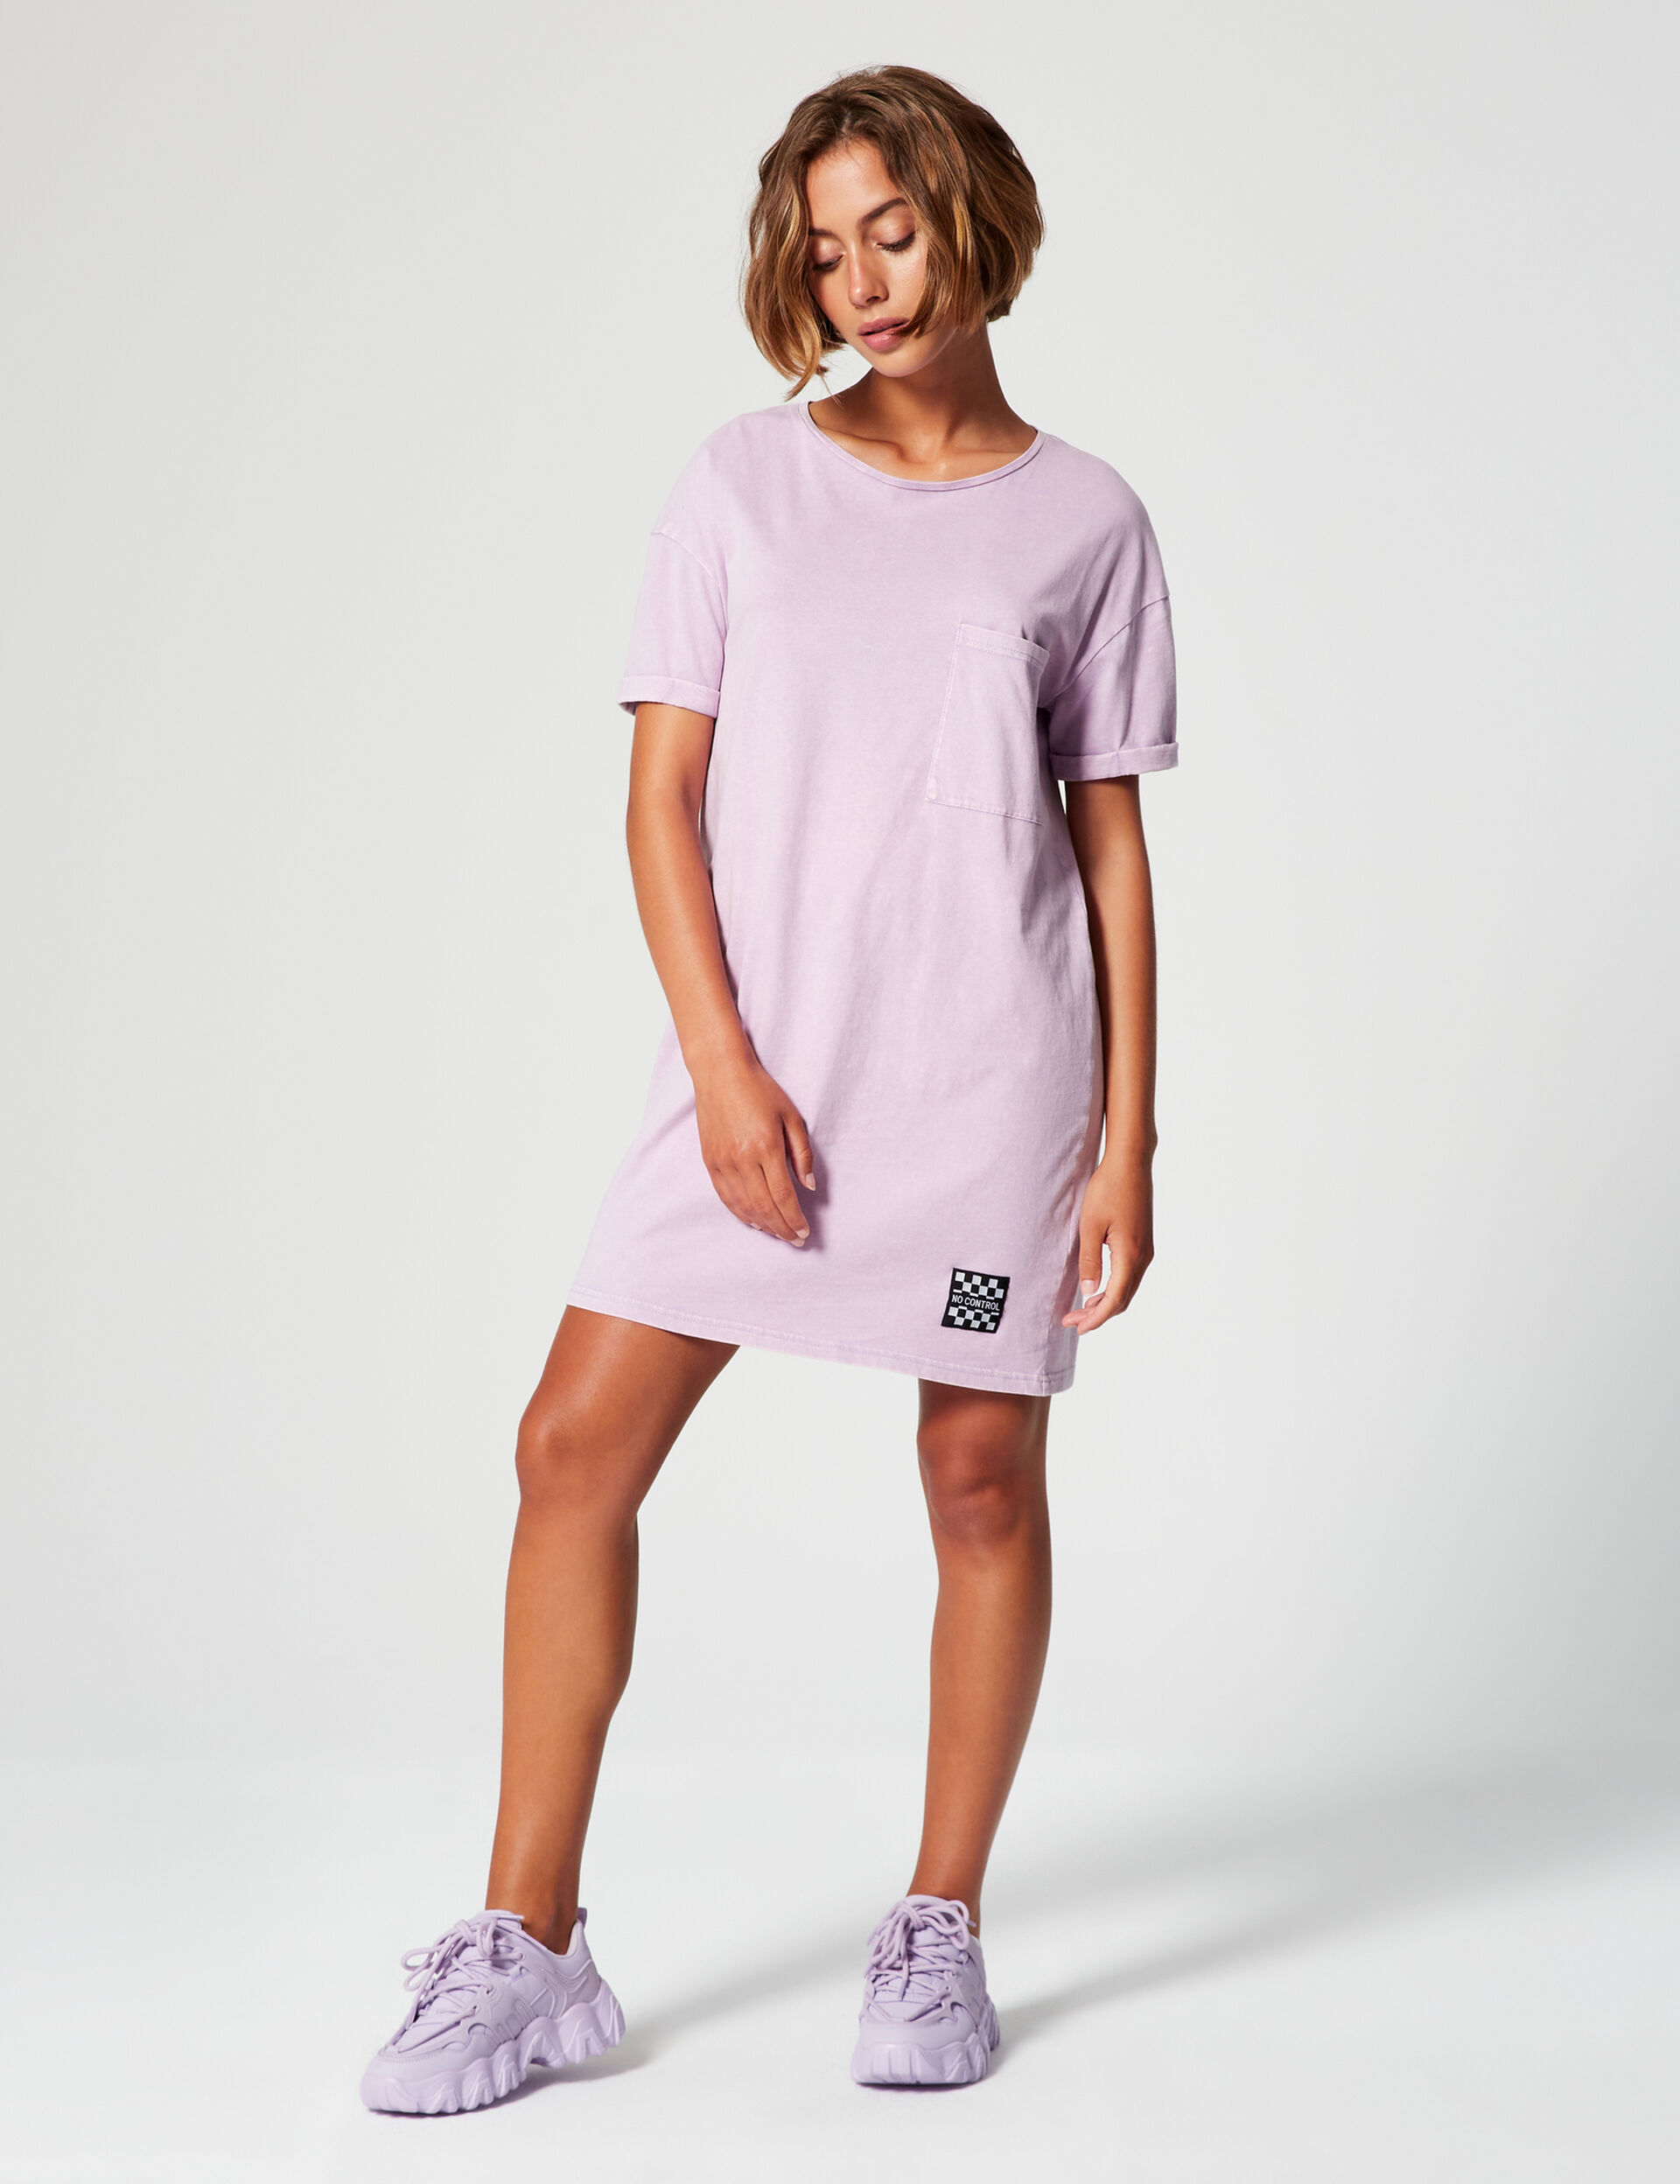 Distressed-effect T-shirt dress